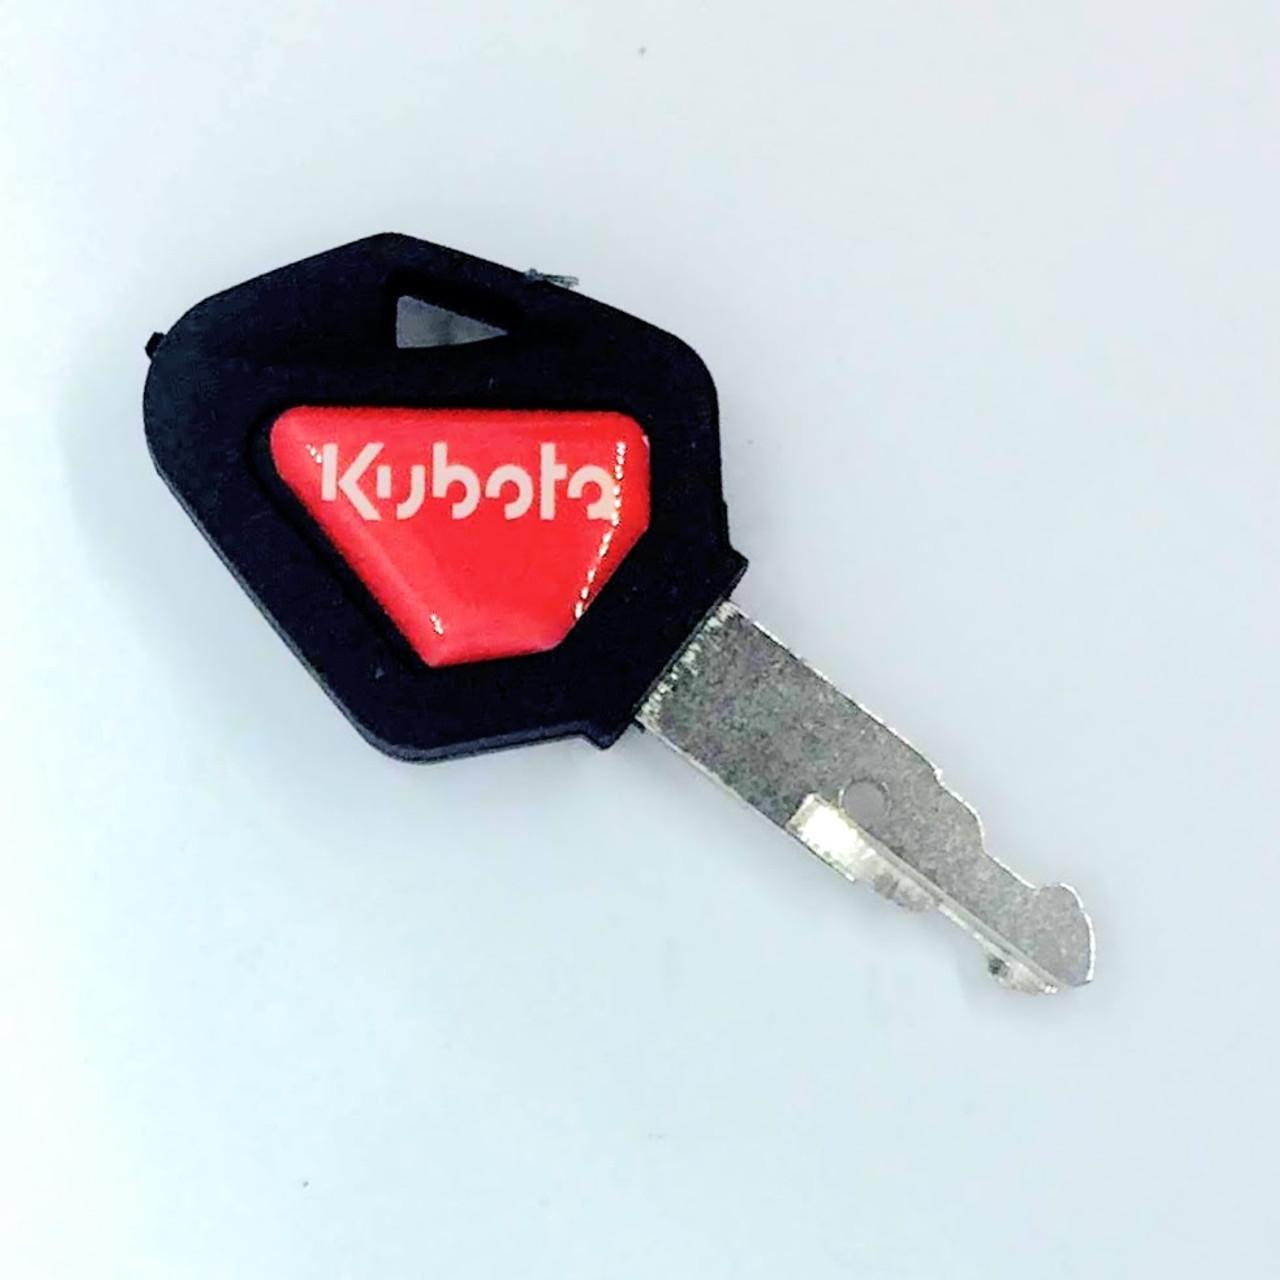 Kubota Excavator Key